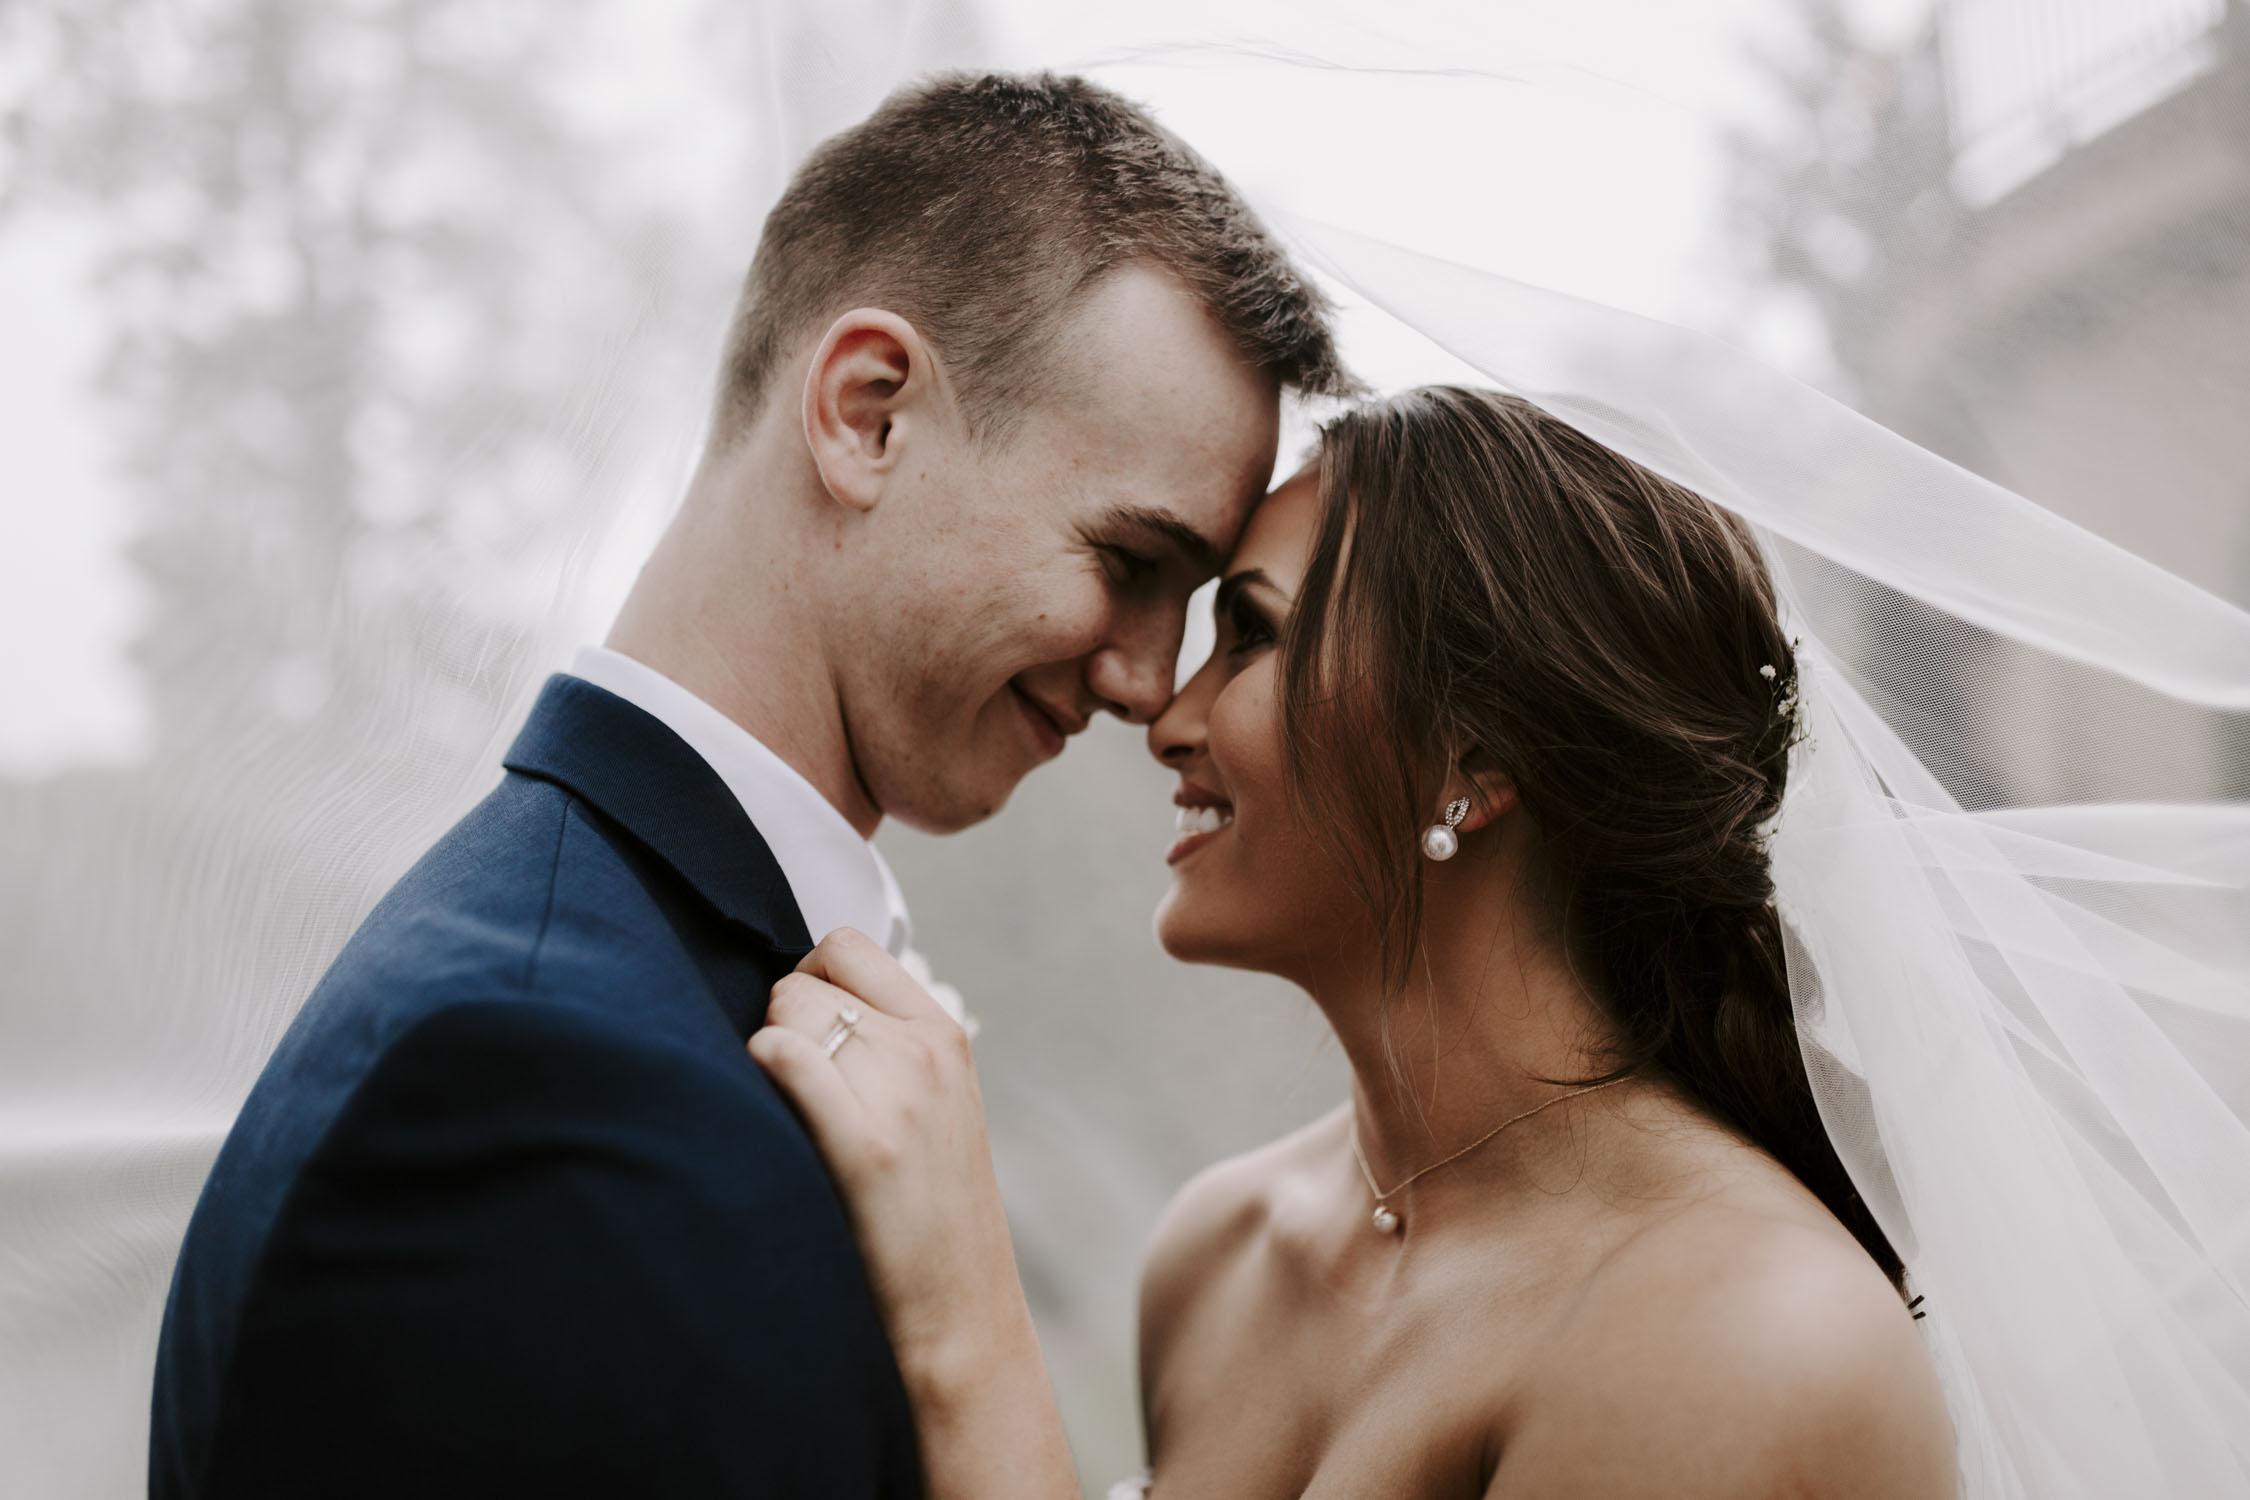 Rainy Bella Collina Wedding - Bride and Groom Newlywed Portraits | Kayli LaFon Photography, Greensboro Winston-Salem NC Wedding Photographer